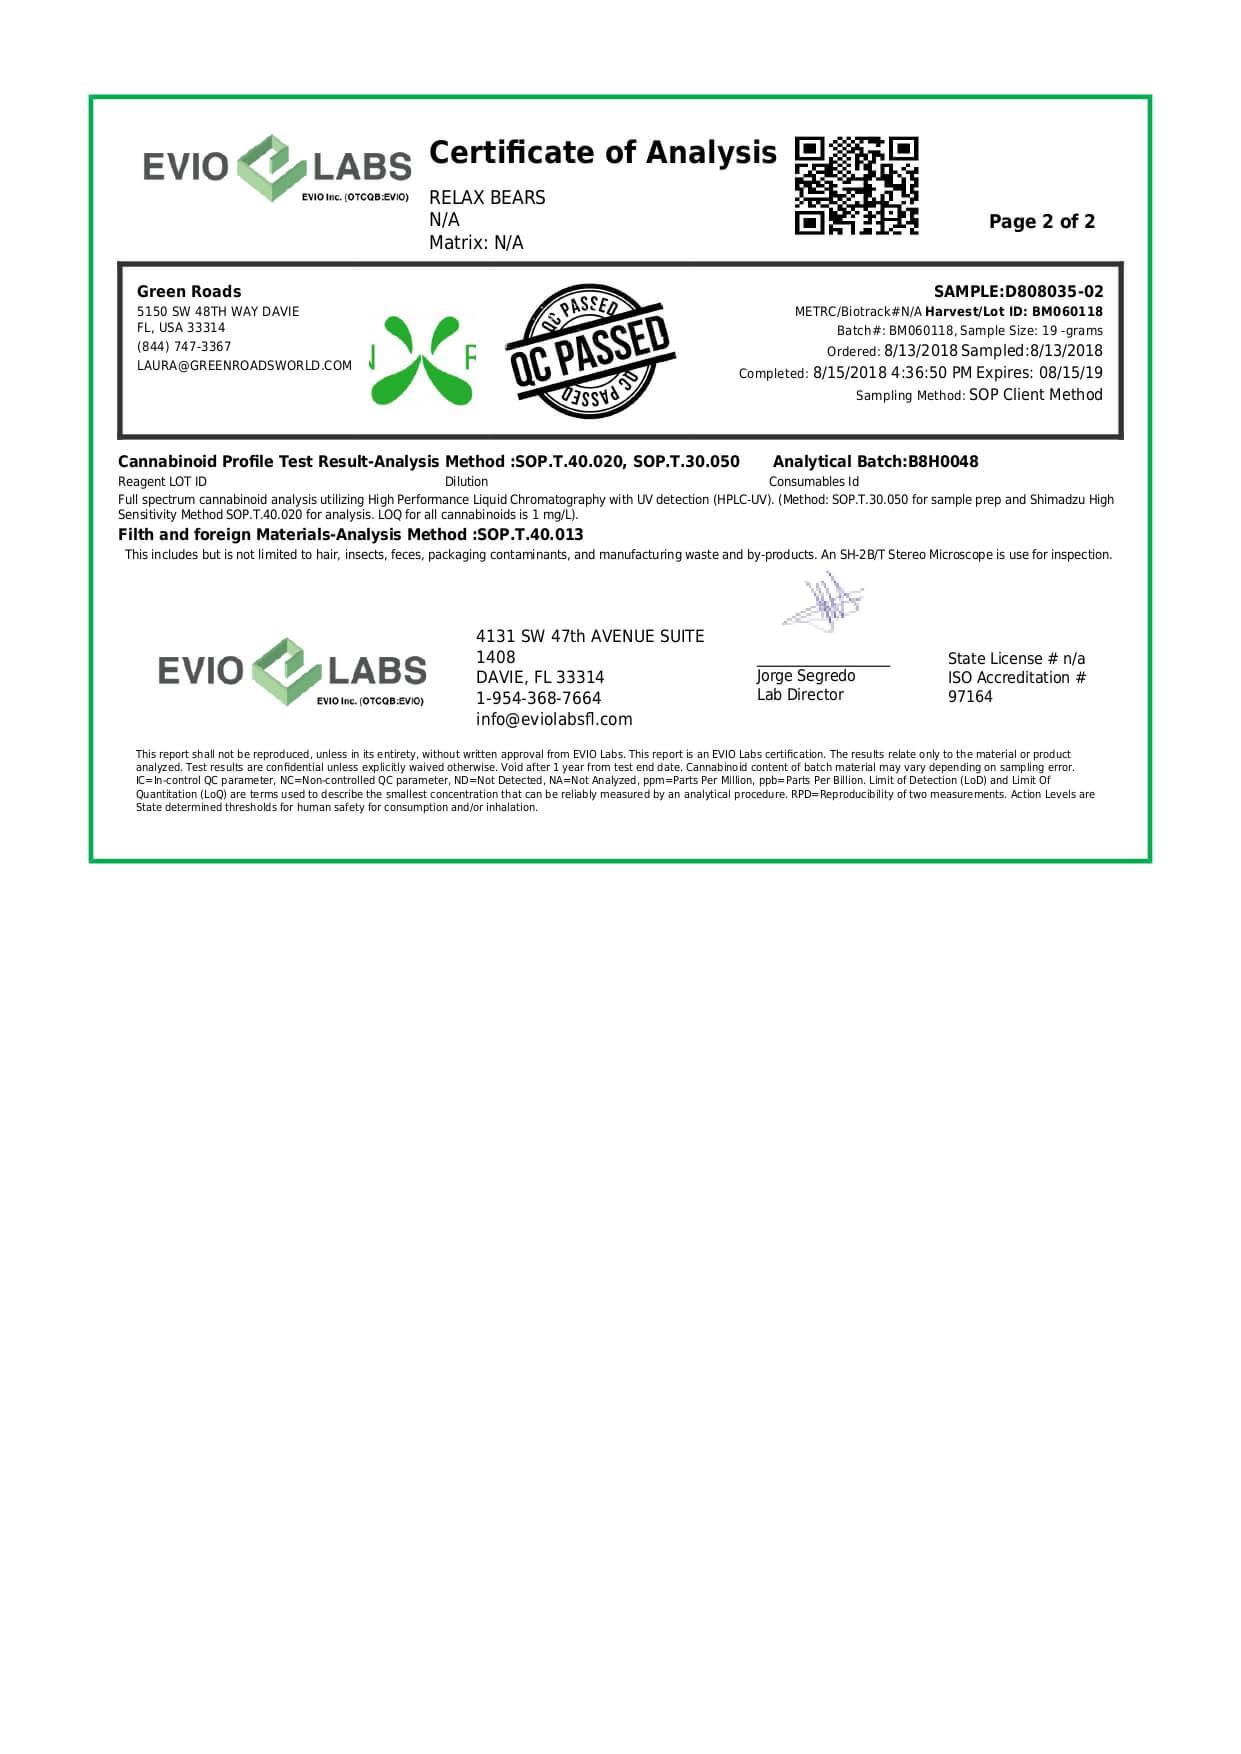 Green Roads CBD Relax Bears 300mg Lab Report